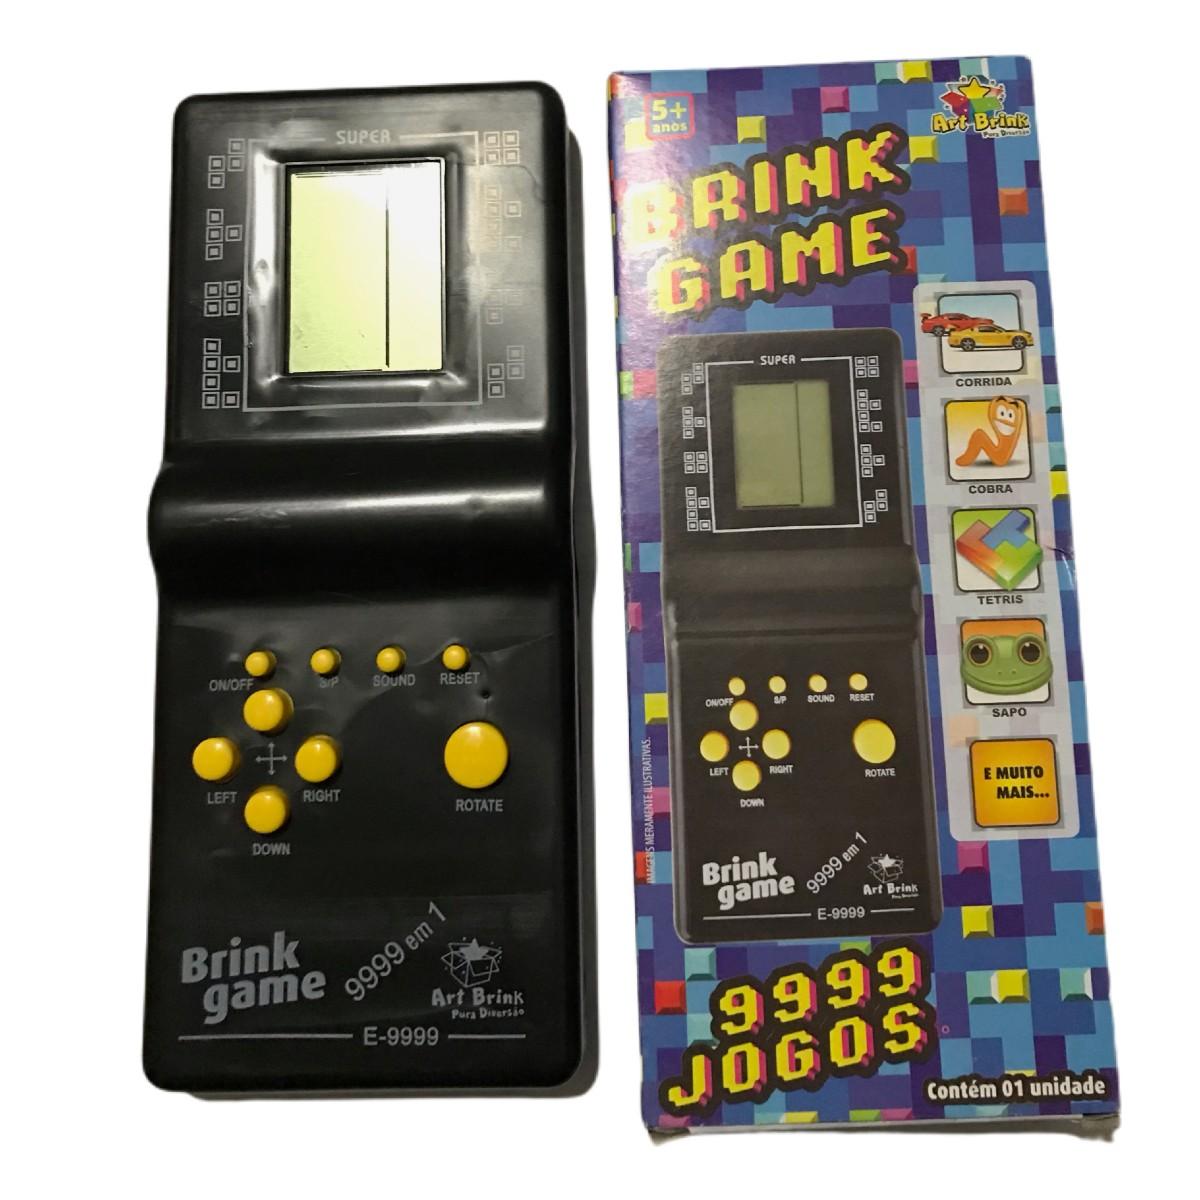 Brink Mini Game Jogo Retrô 9999 em 1 Art Brink